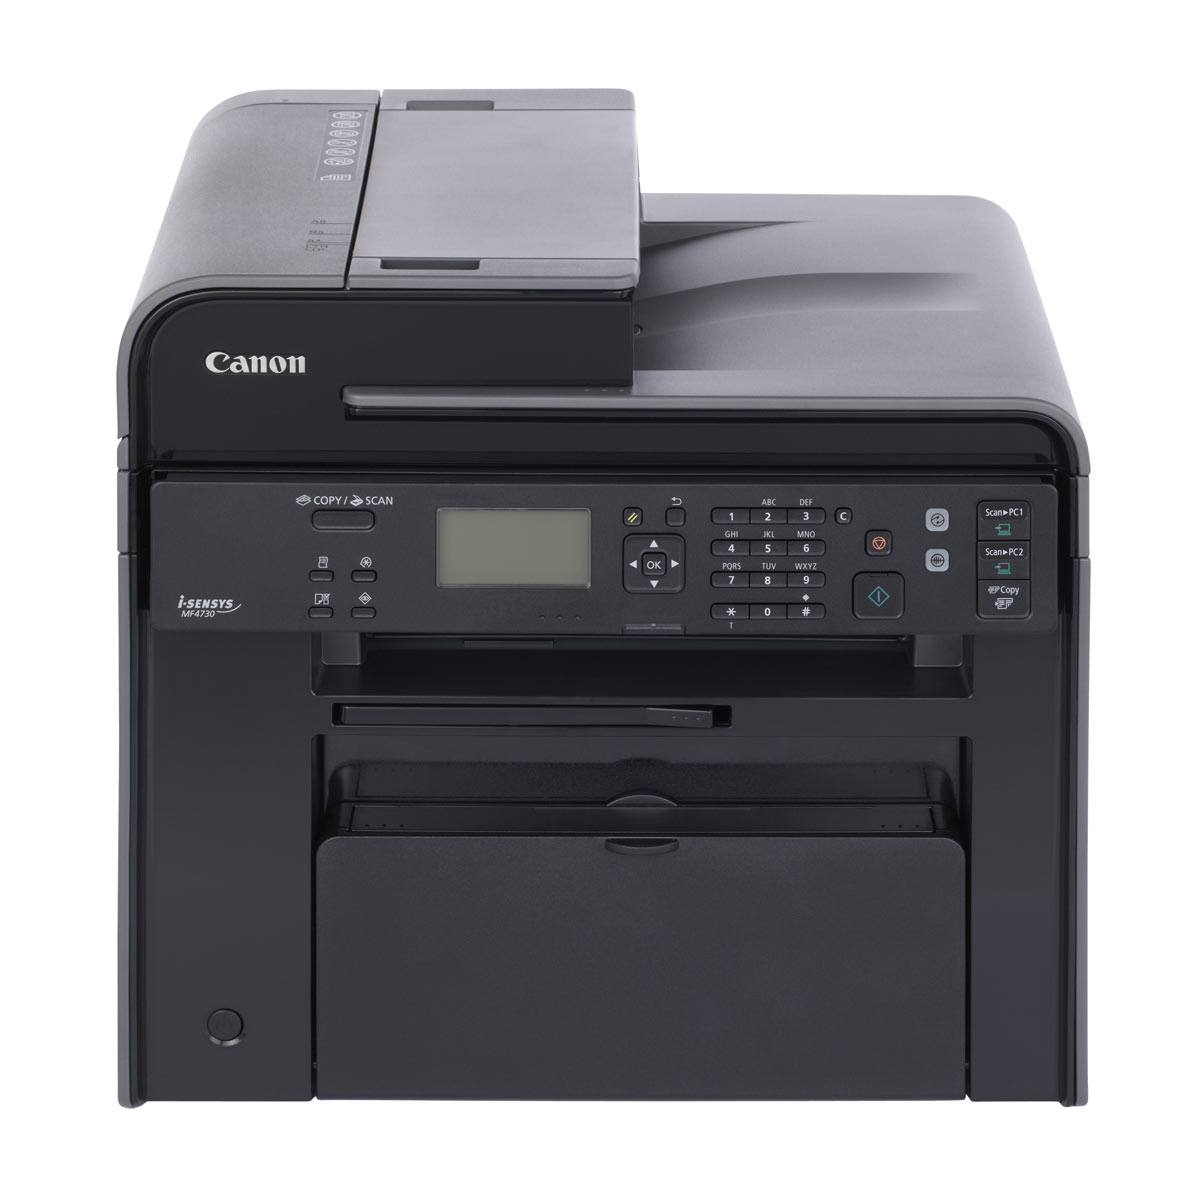 canon i sensys mf4730 imprimante multifonction canon sur. Black Bedroom Furniture Sets. Home Design Ideas